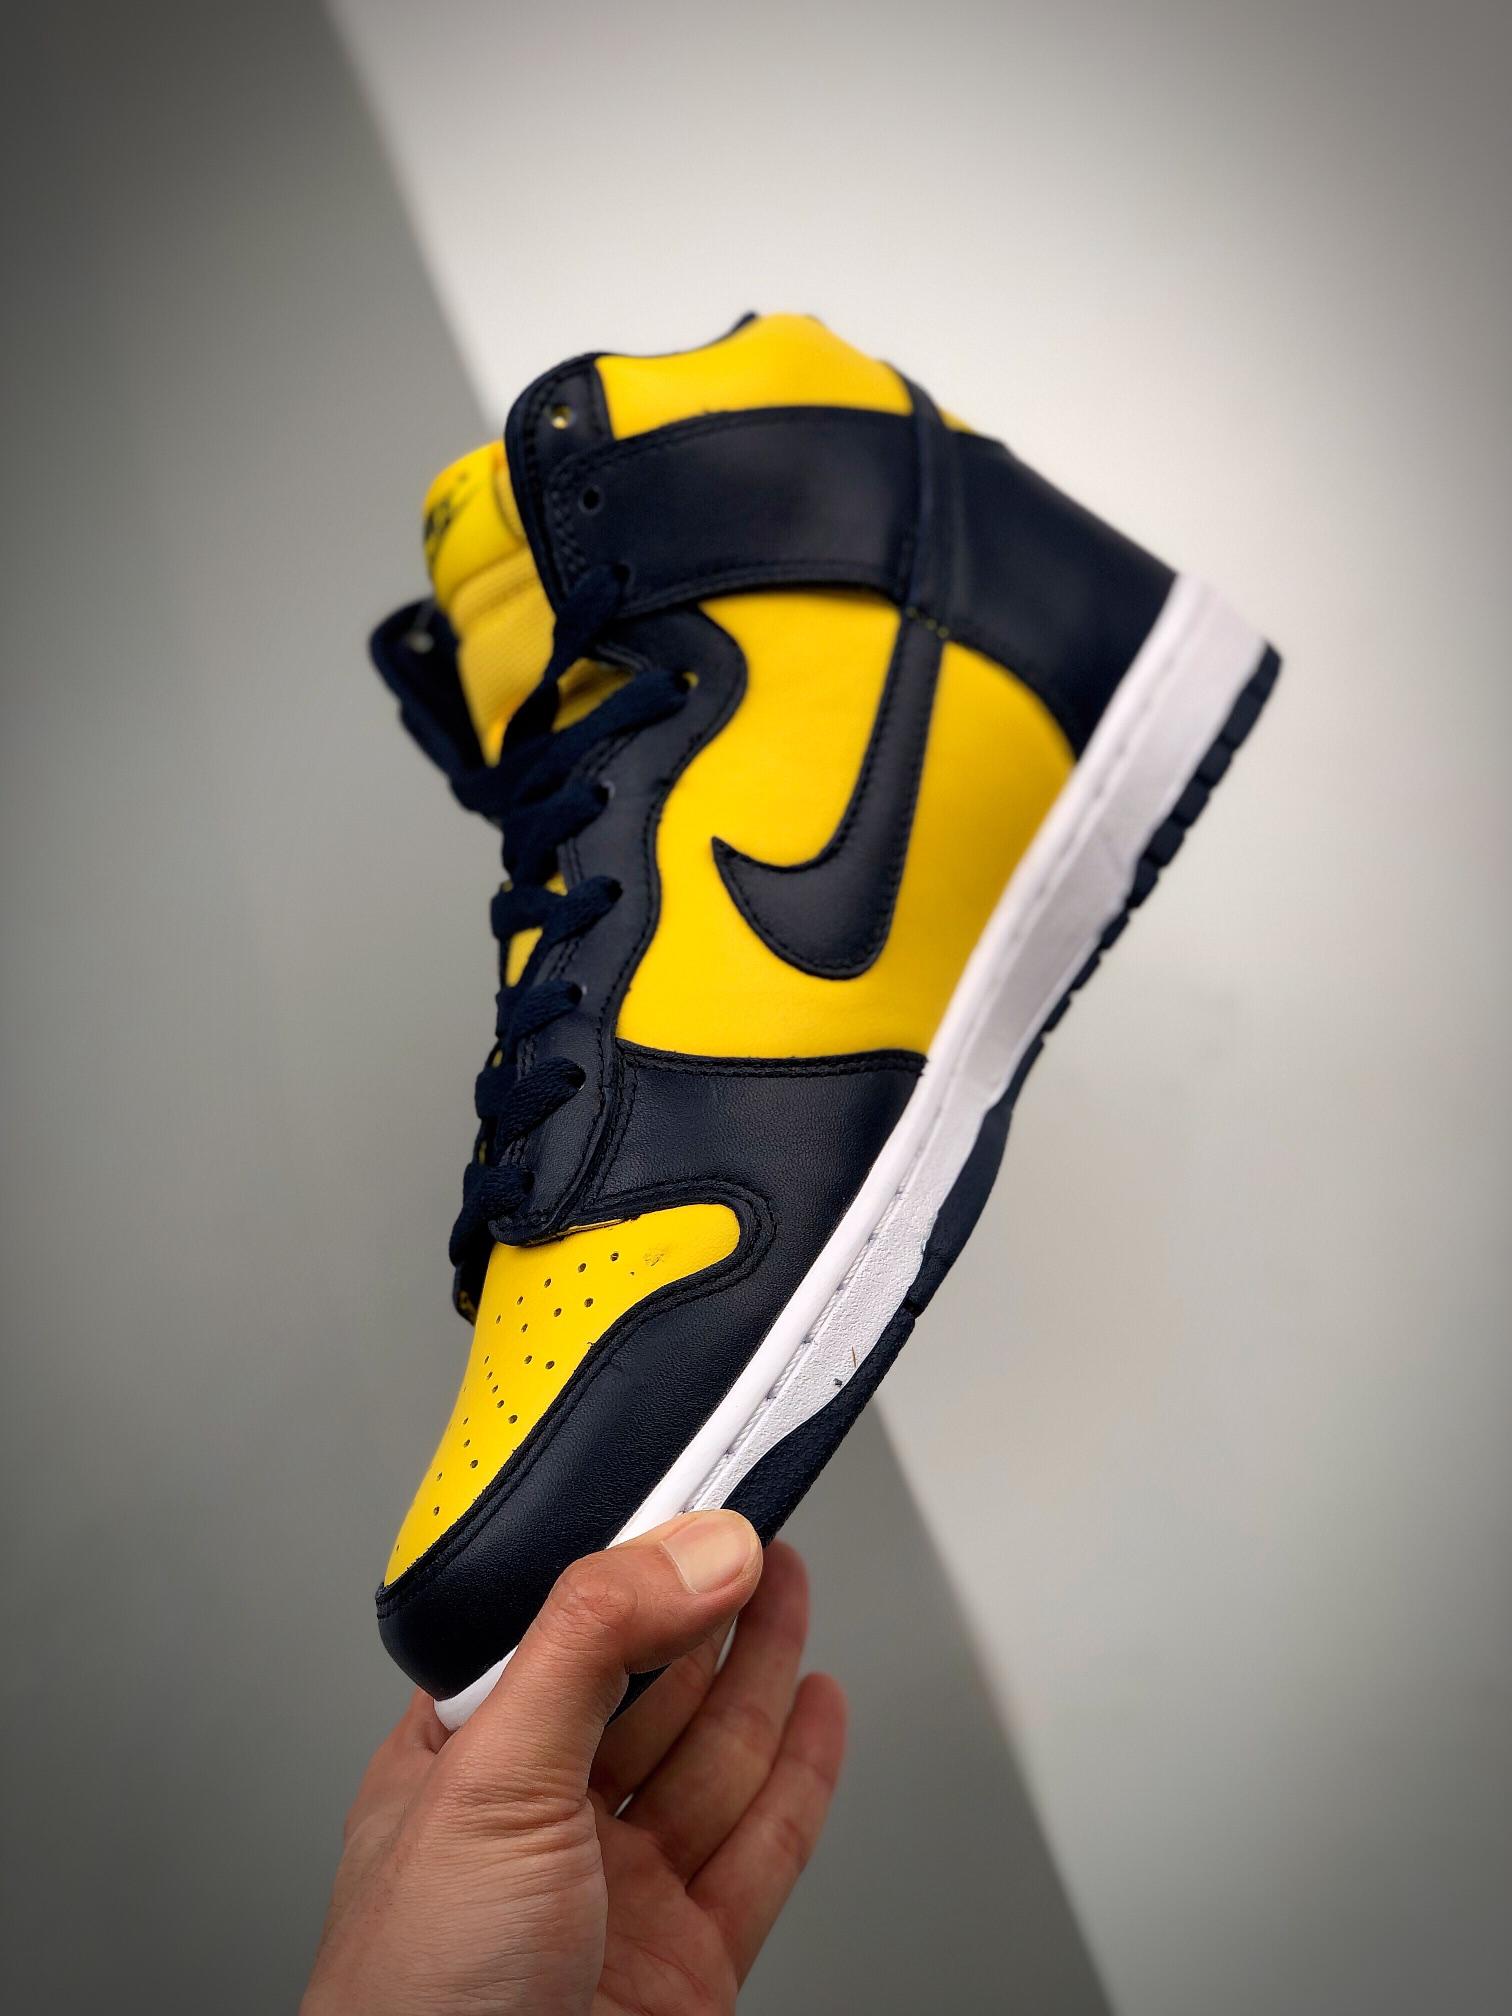 NK SB Dunk Hi SP 'Michigan' 密歇根313170-021_莆田鞋最高版本啥意思